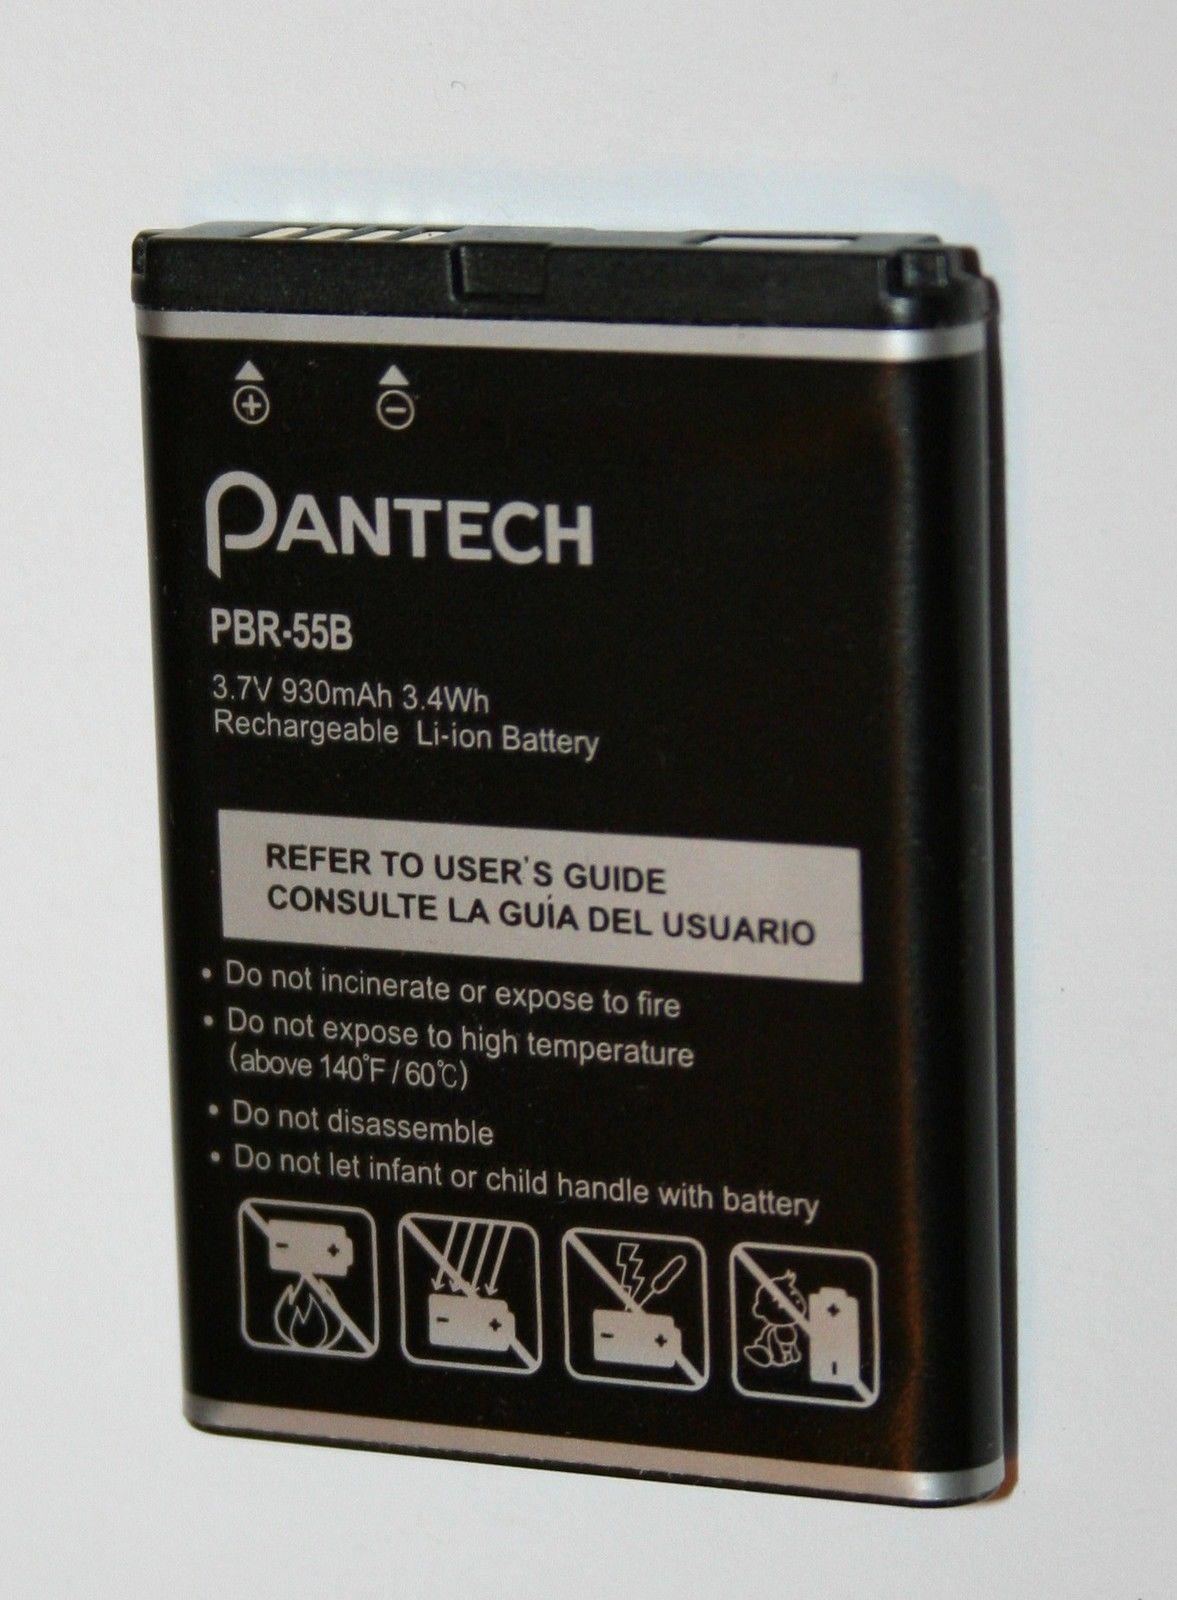 Lot of 10 Used OEM PANTECH Battery PBR-55B Impact P7000 930mAh image 2